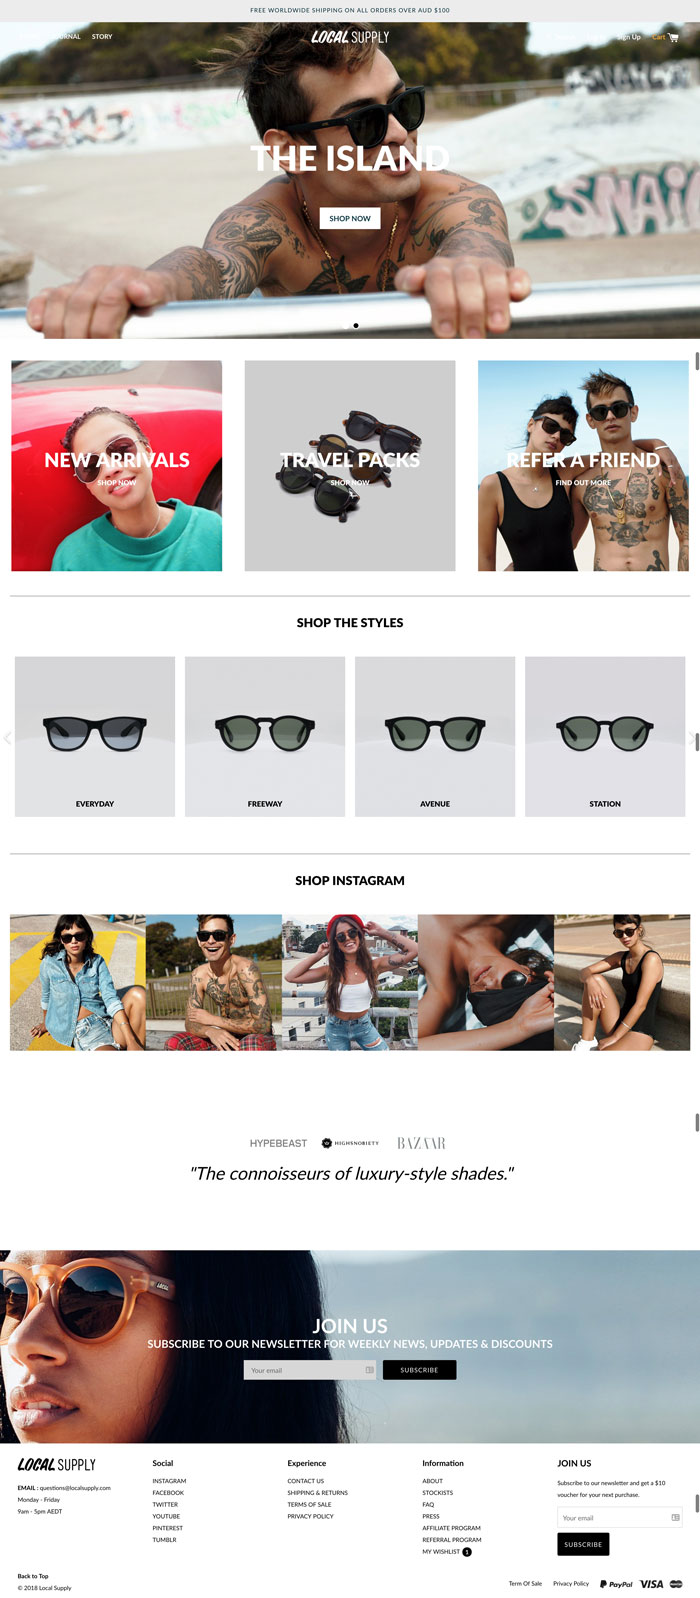 Local Supply polarized sunglasses